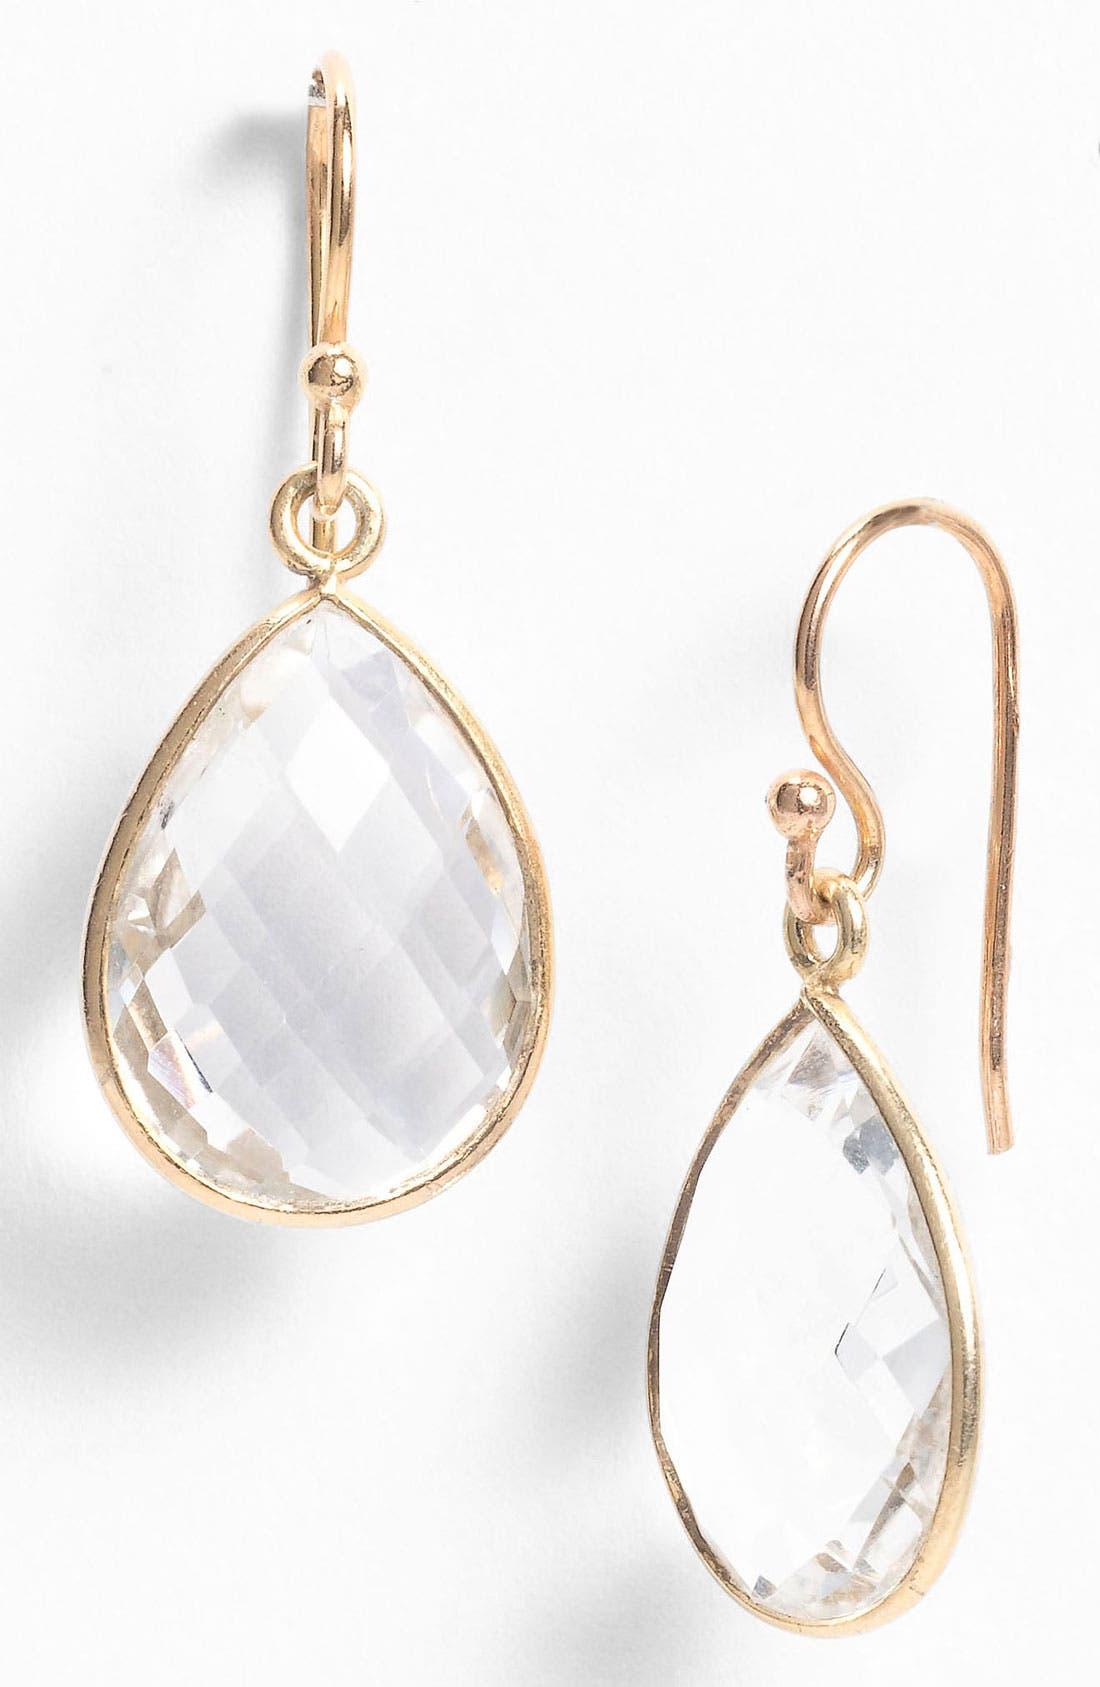 Main Image - NuNu Designs 'Candy' Teardrop Earrings